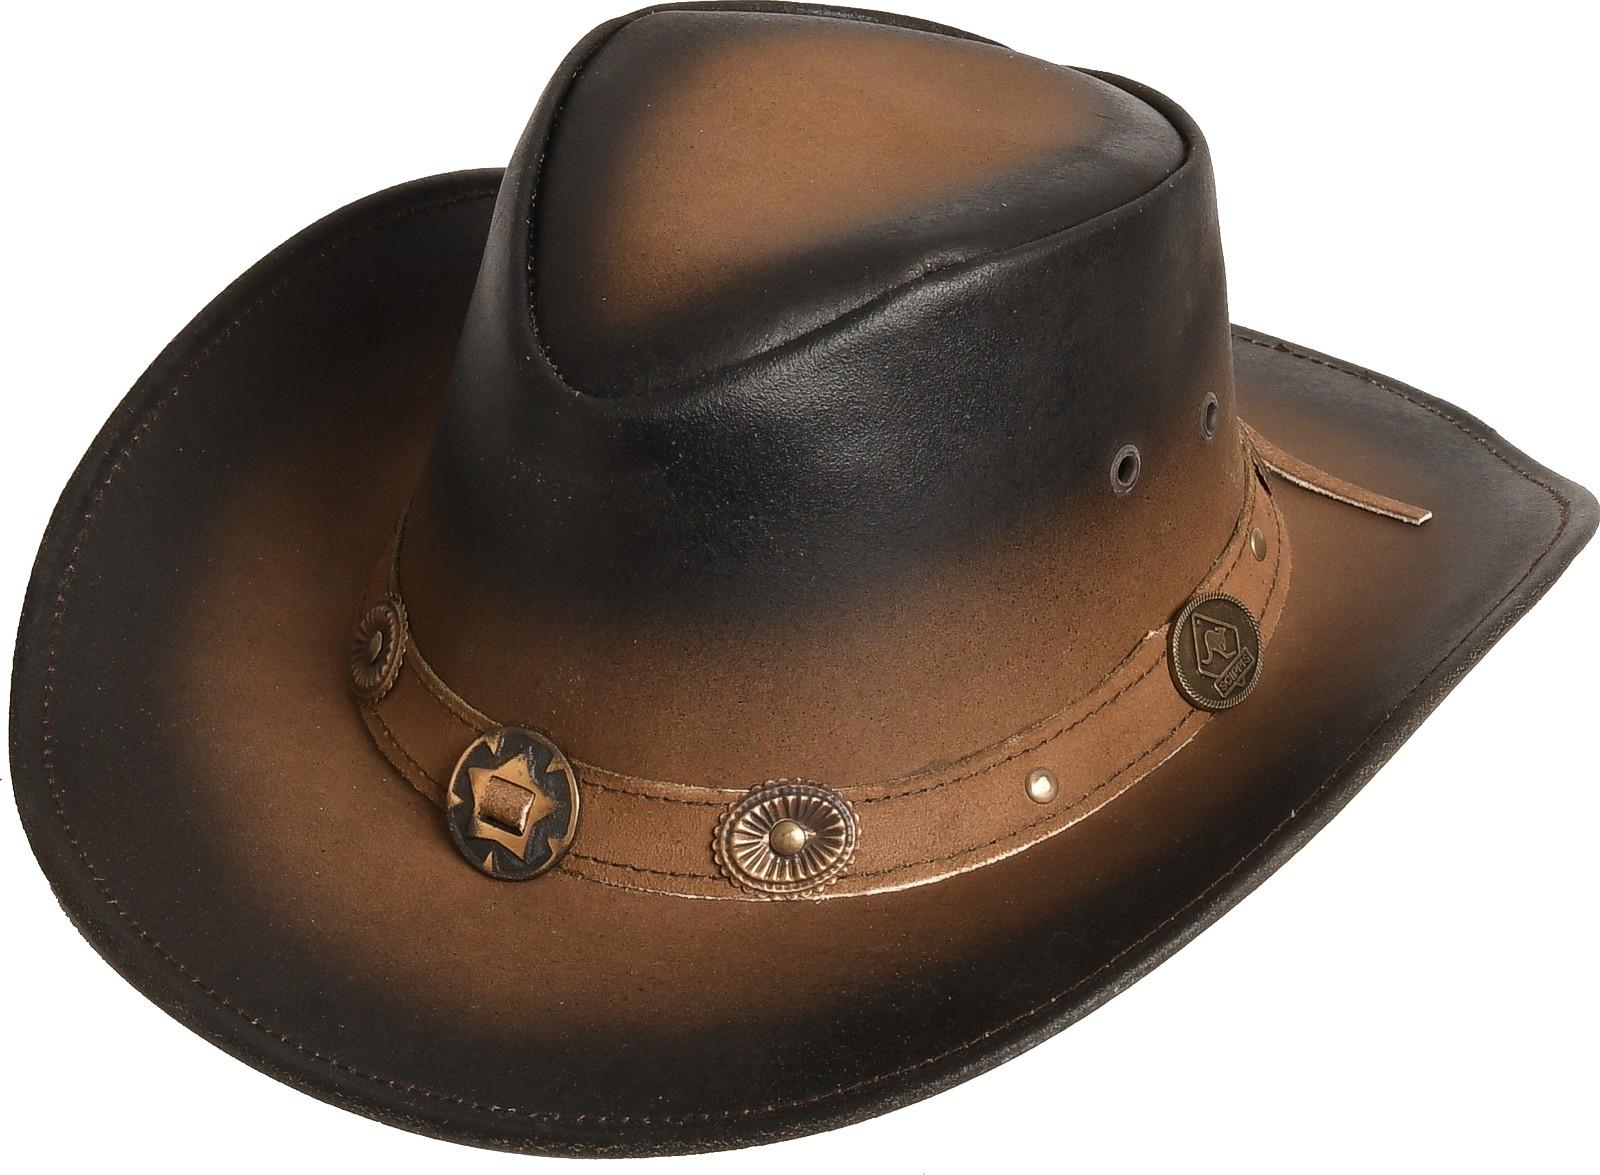 Rugged Earth Leder Westernhut Cowboyhut »Tombstone« Stonewash